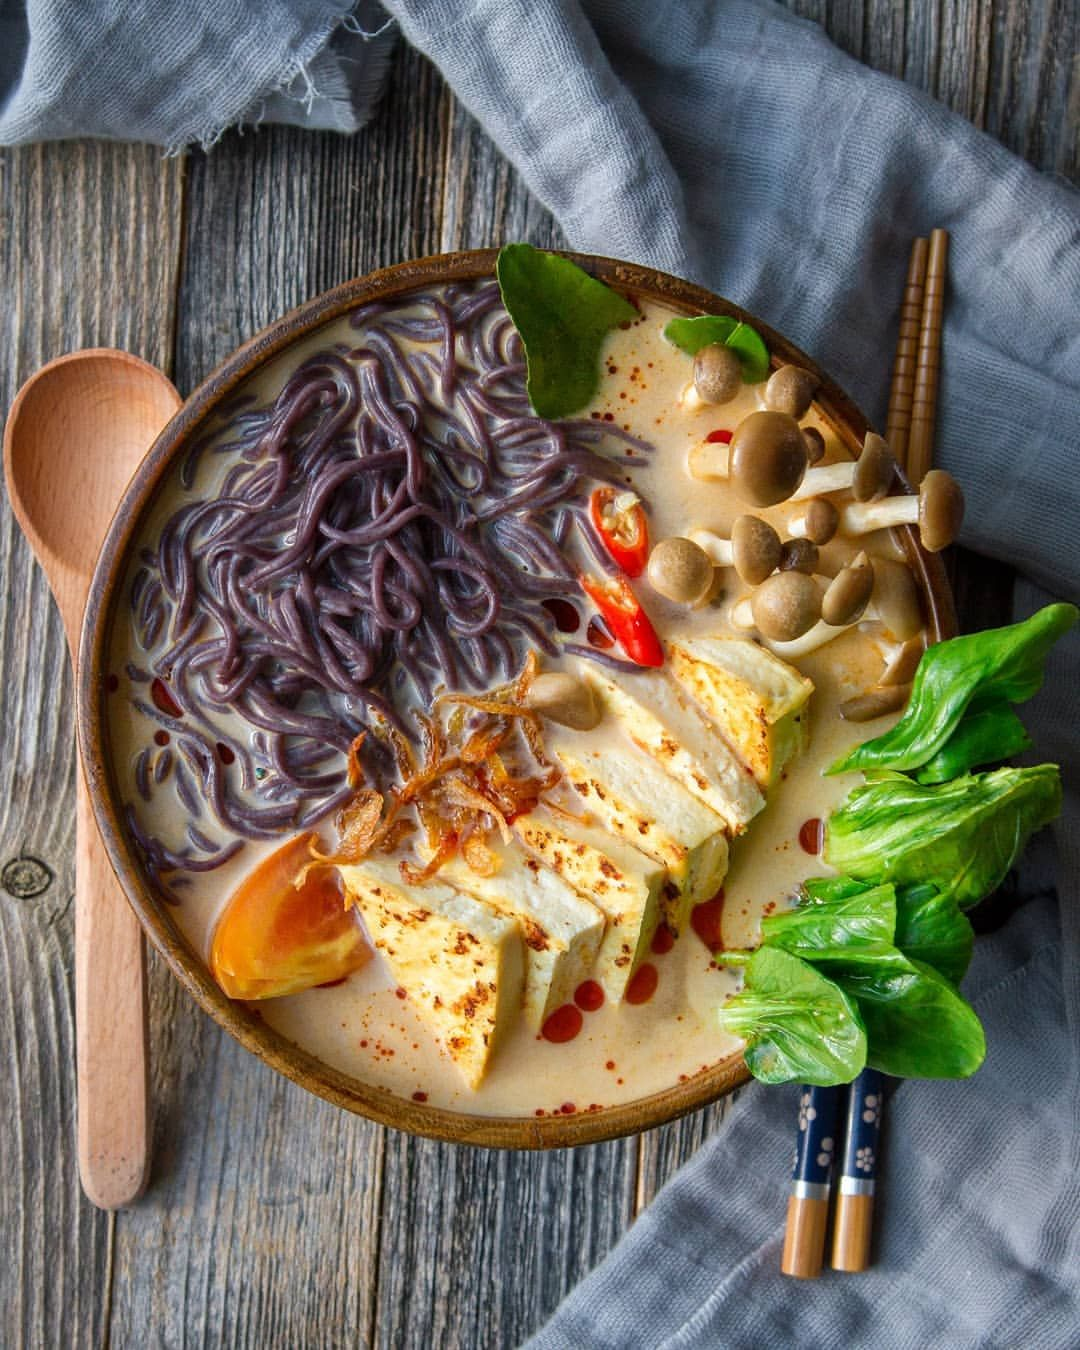 Tofu and Black Rice Noodle Soup